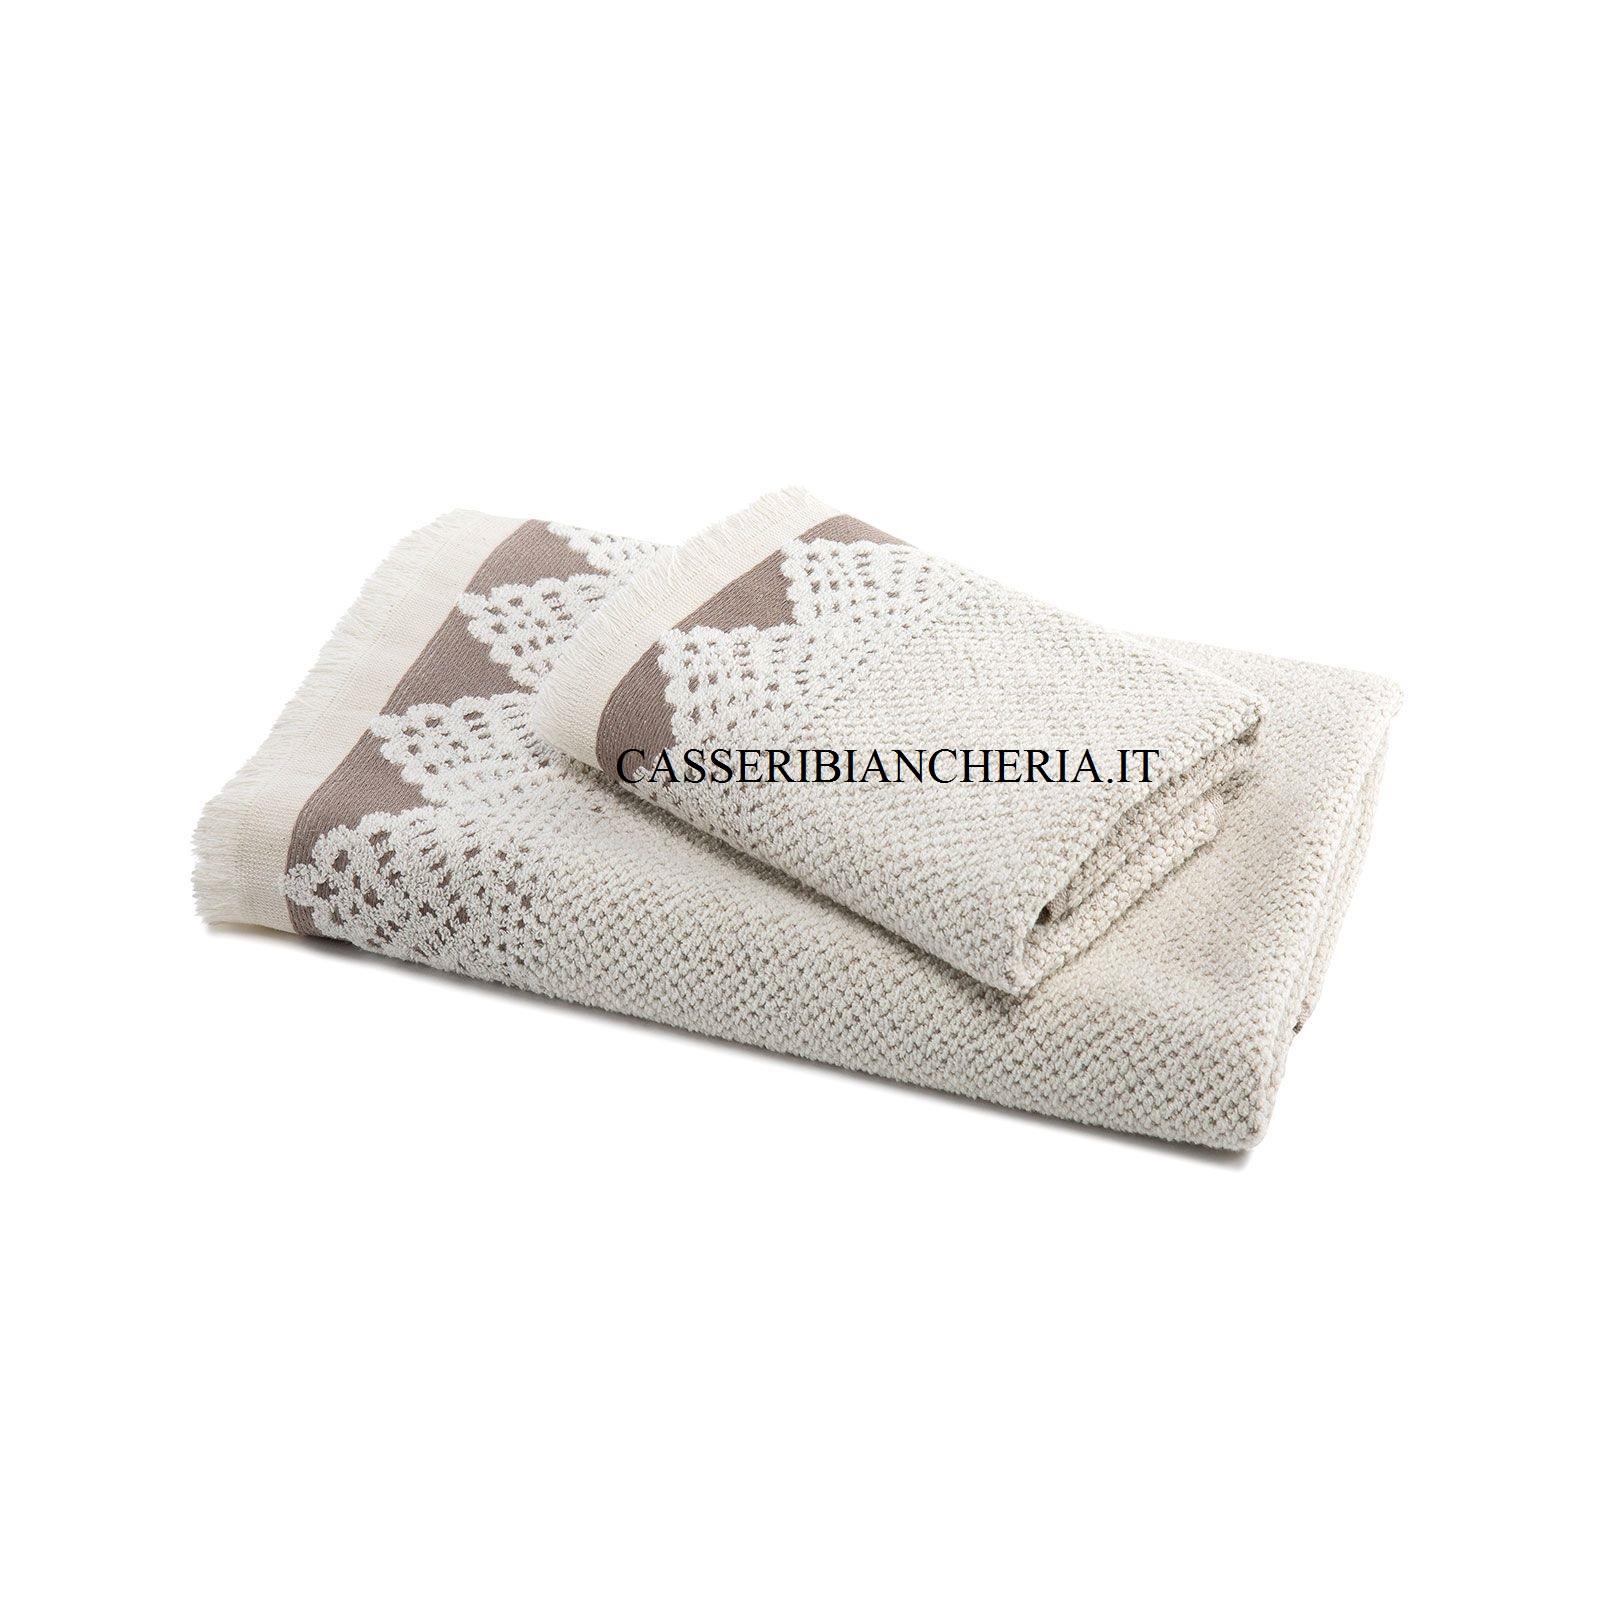 Scatola 3 coppie asciugamani caleffi procida naturale for Asciugamani caleffi